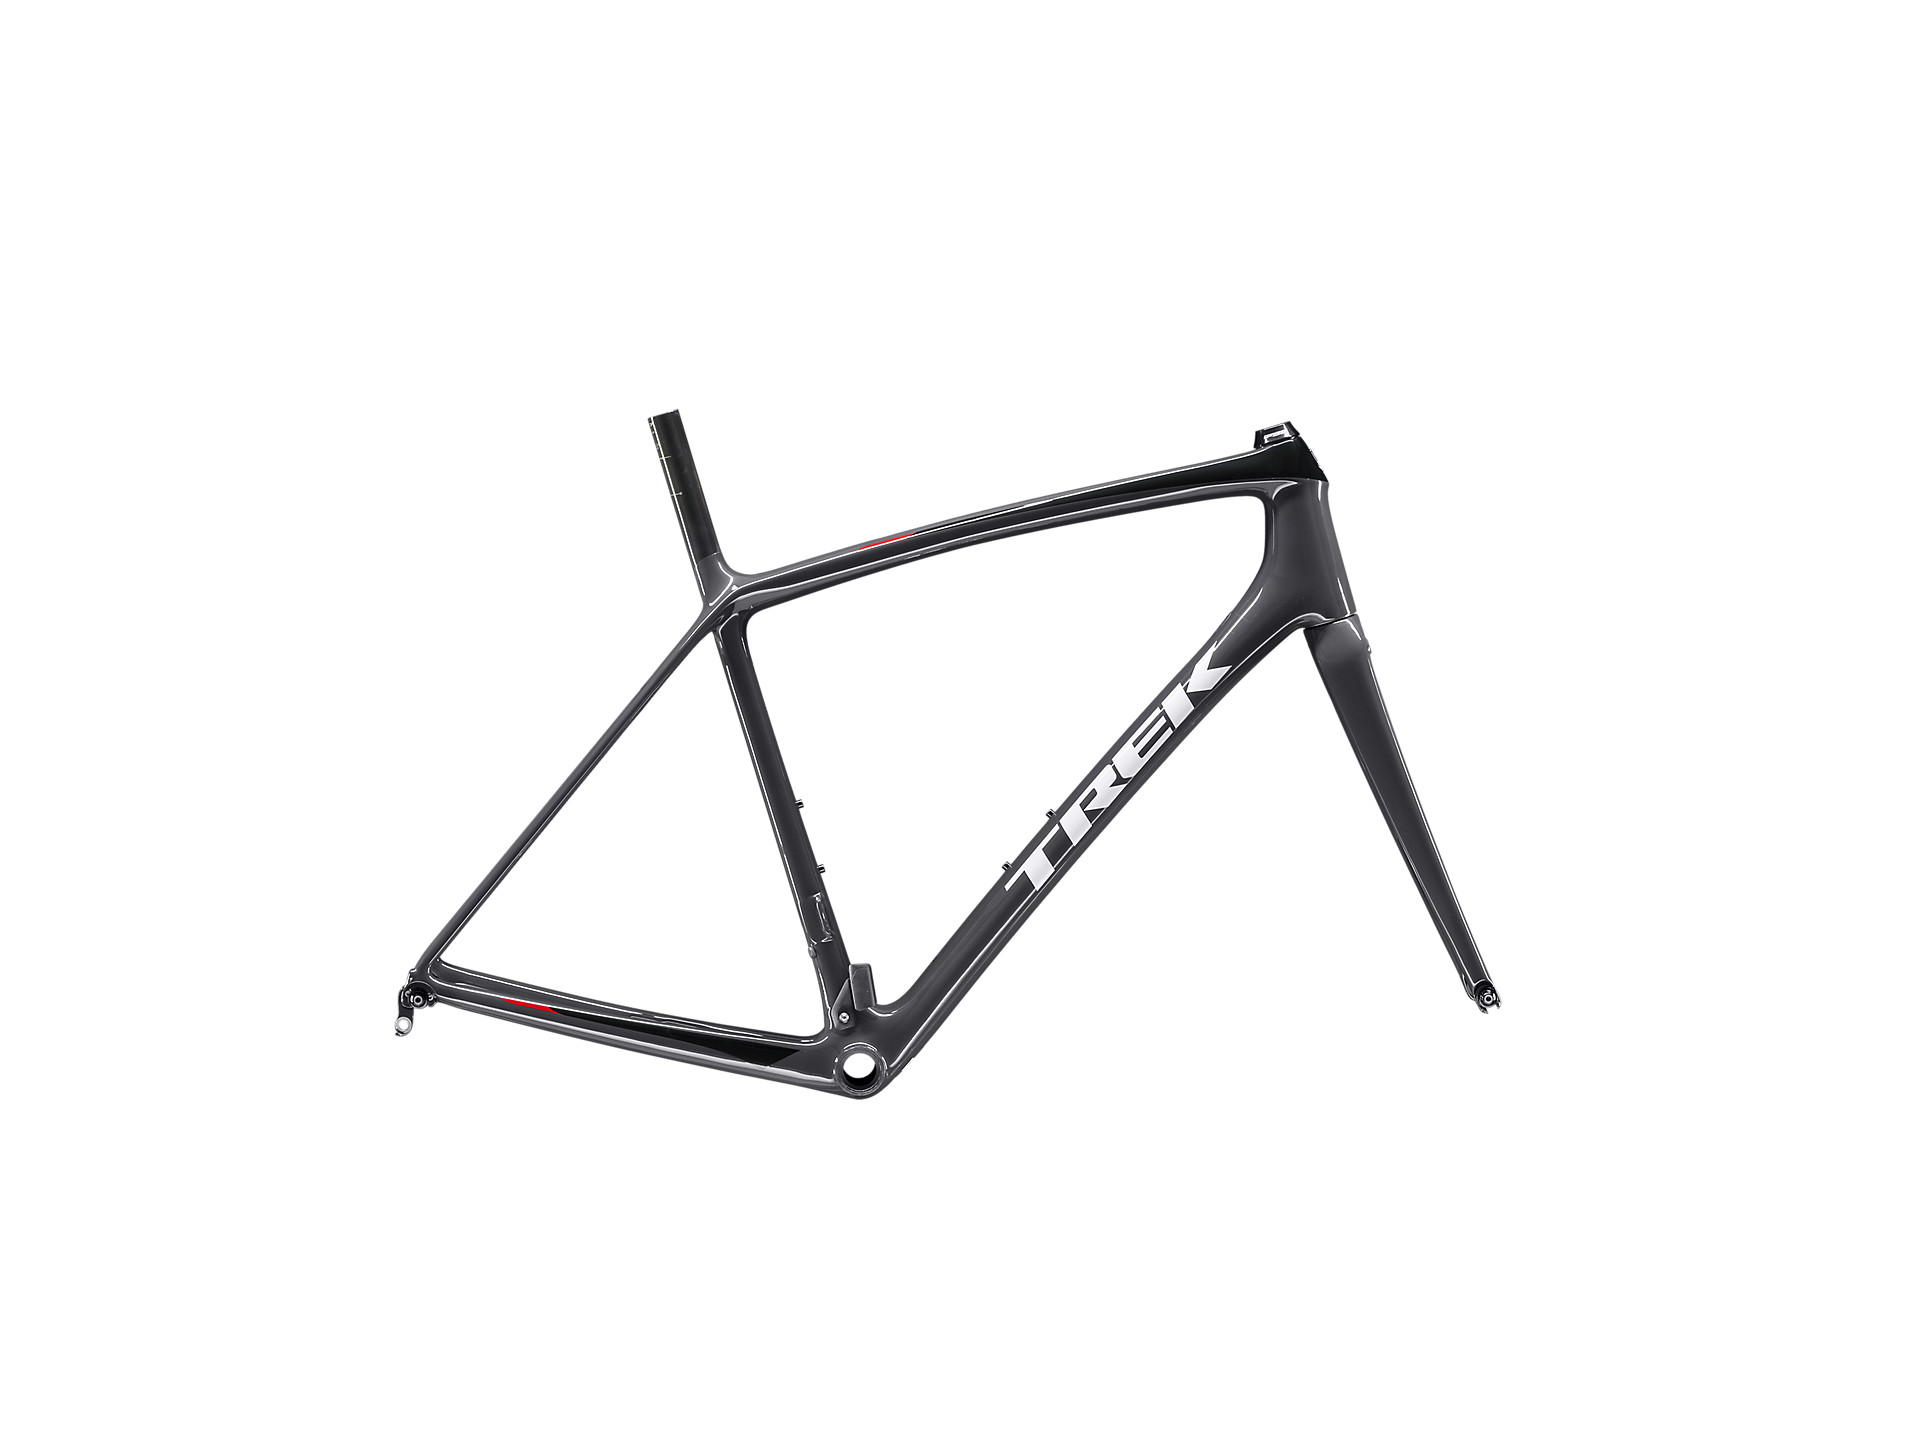 74c5549db82 Émonda SLR H2 Frameset   Trek Bikes